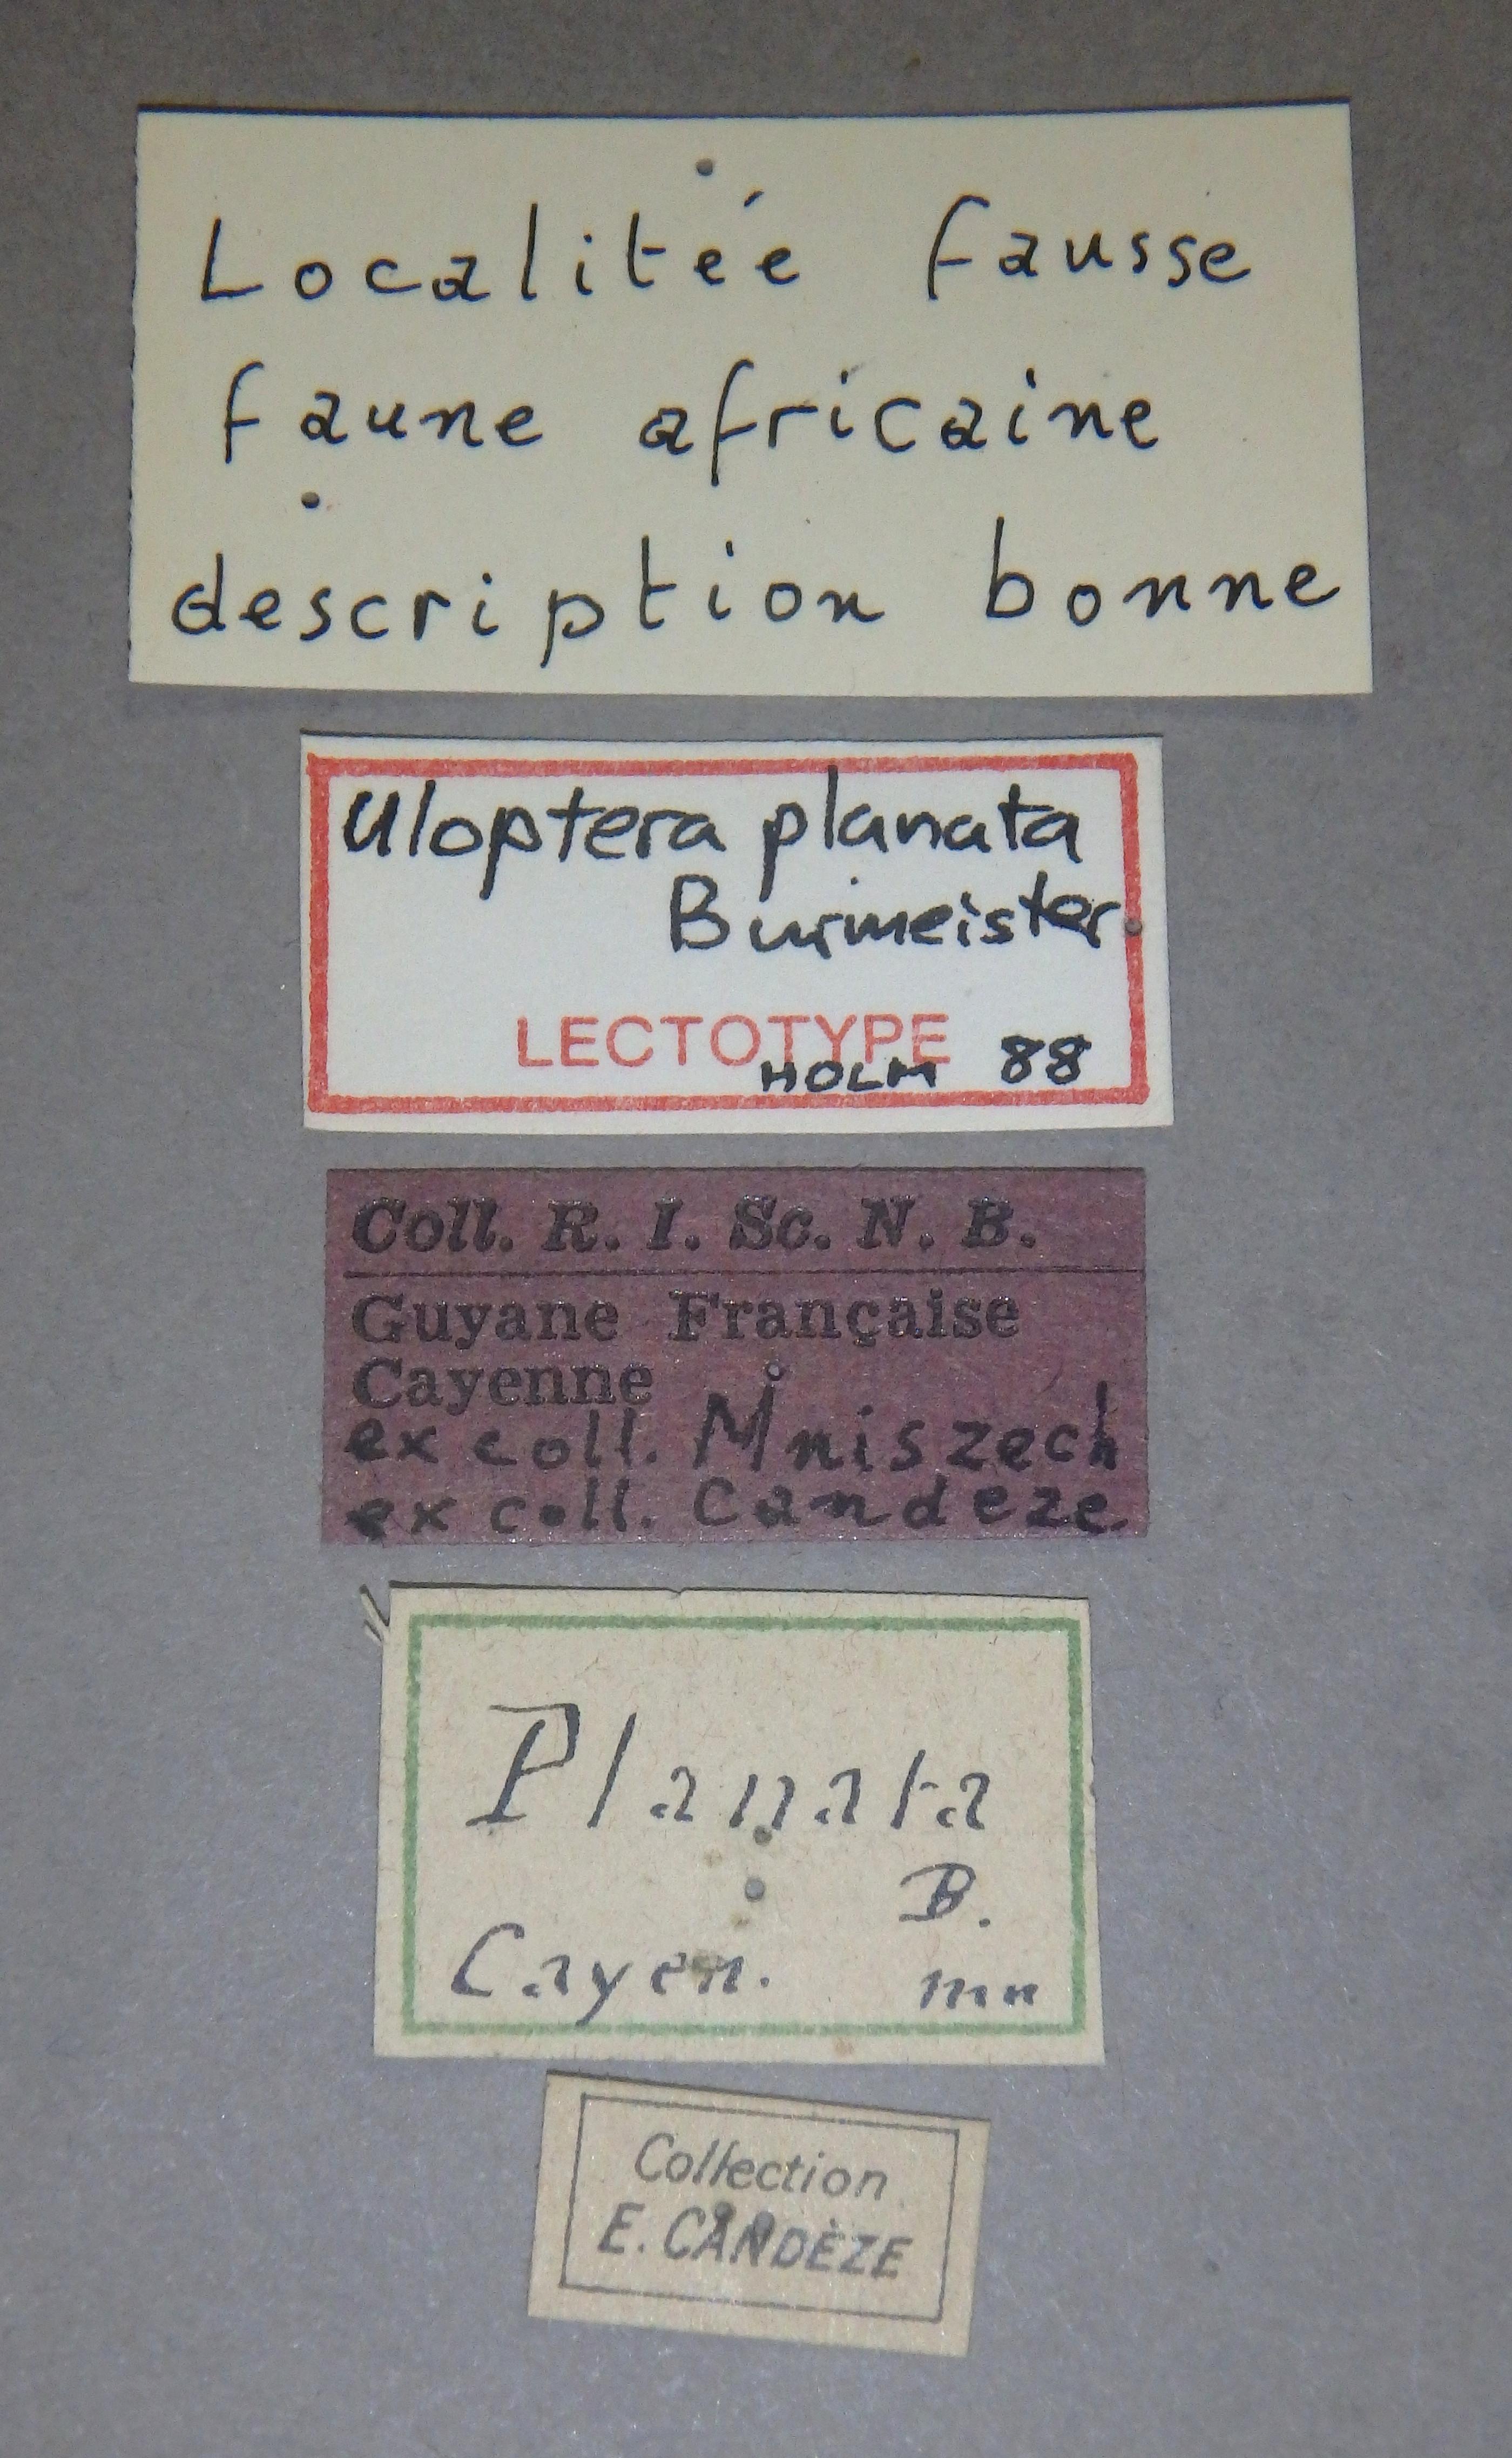 Uloptera planata lt Lb.JPG